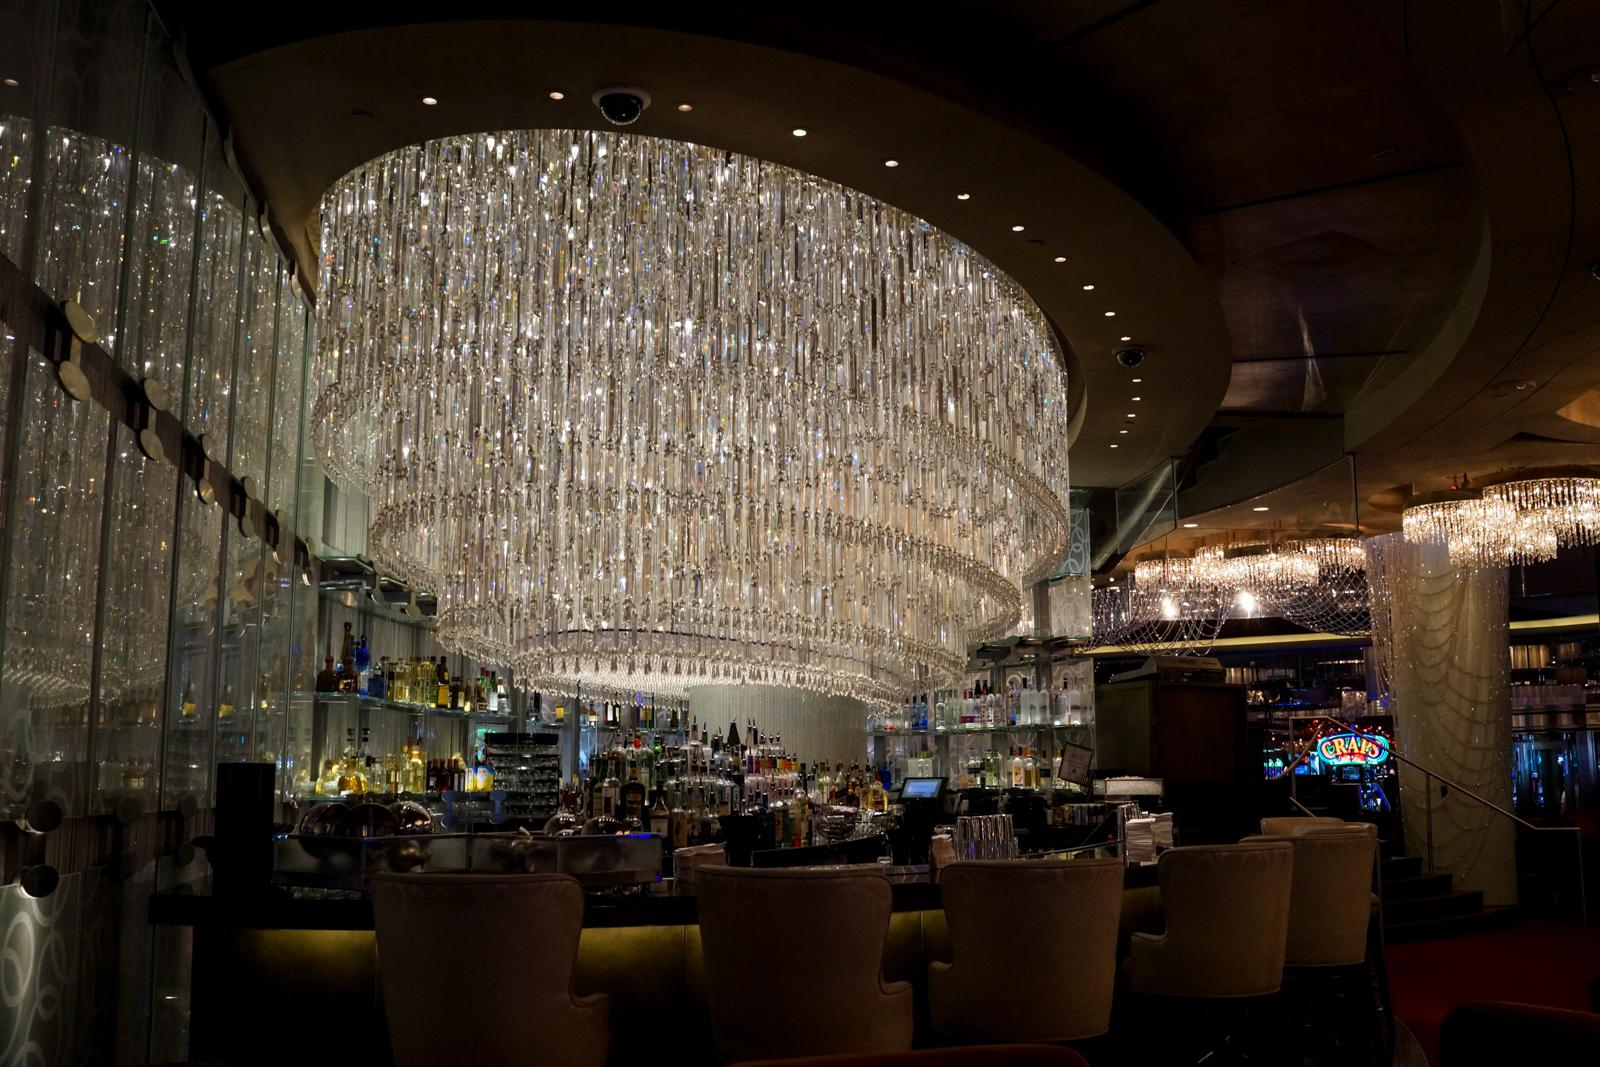 The Cosmopolitan Las Vegas Nevada Hotel Review Resort HotelResort Review The Cosmopolitan of Las